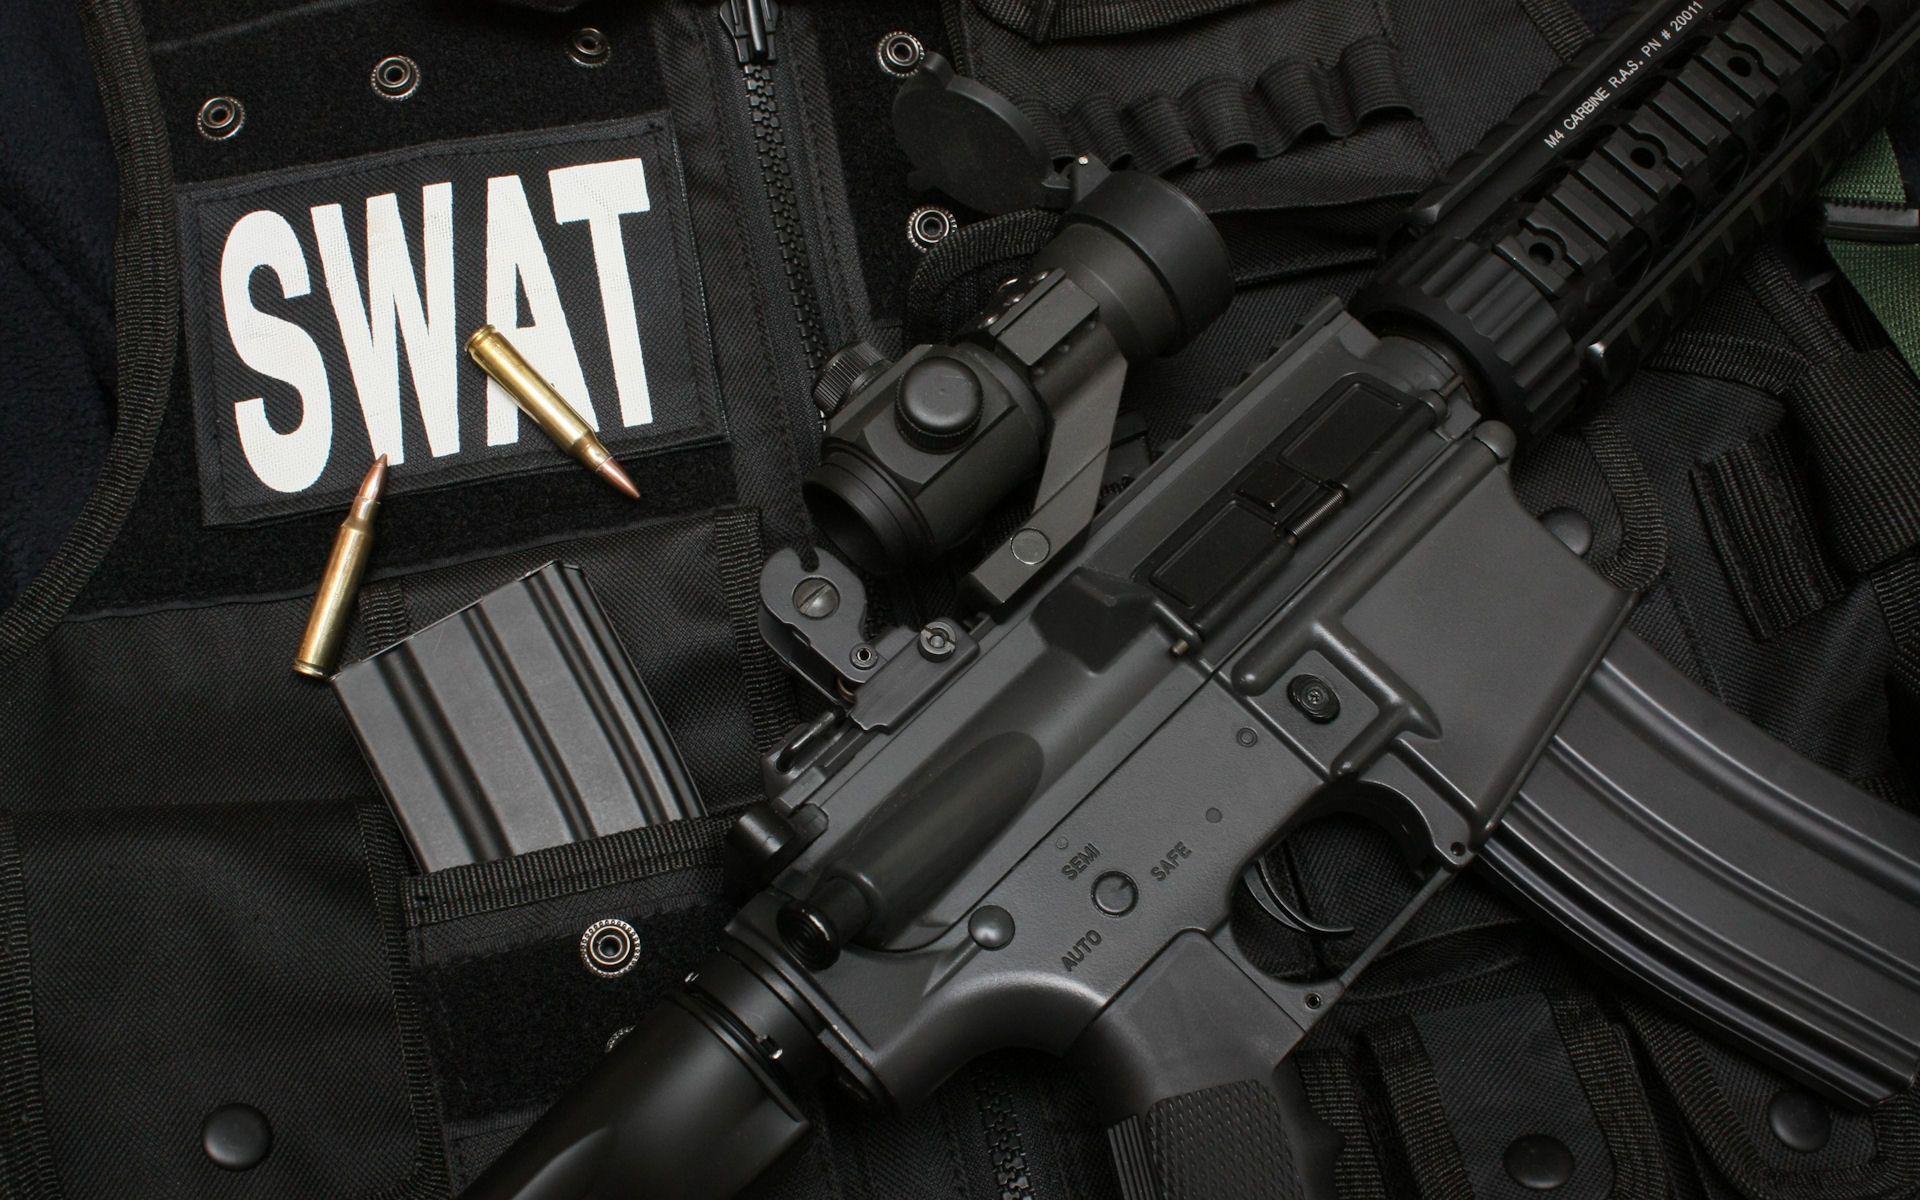 21+ Swat Wallpaper Hd Pictures